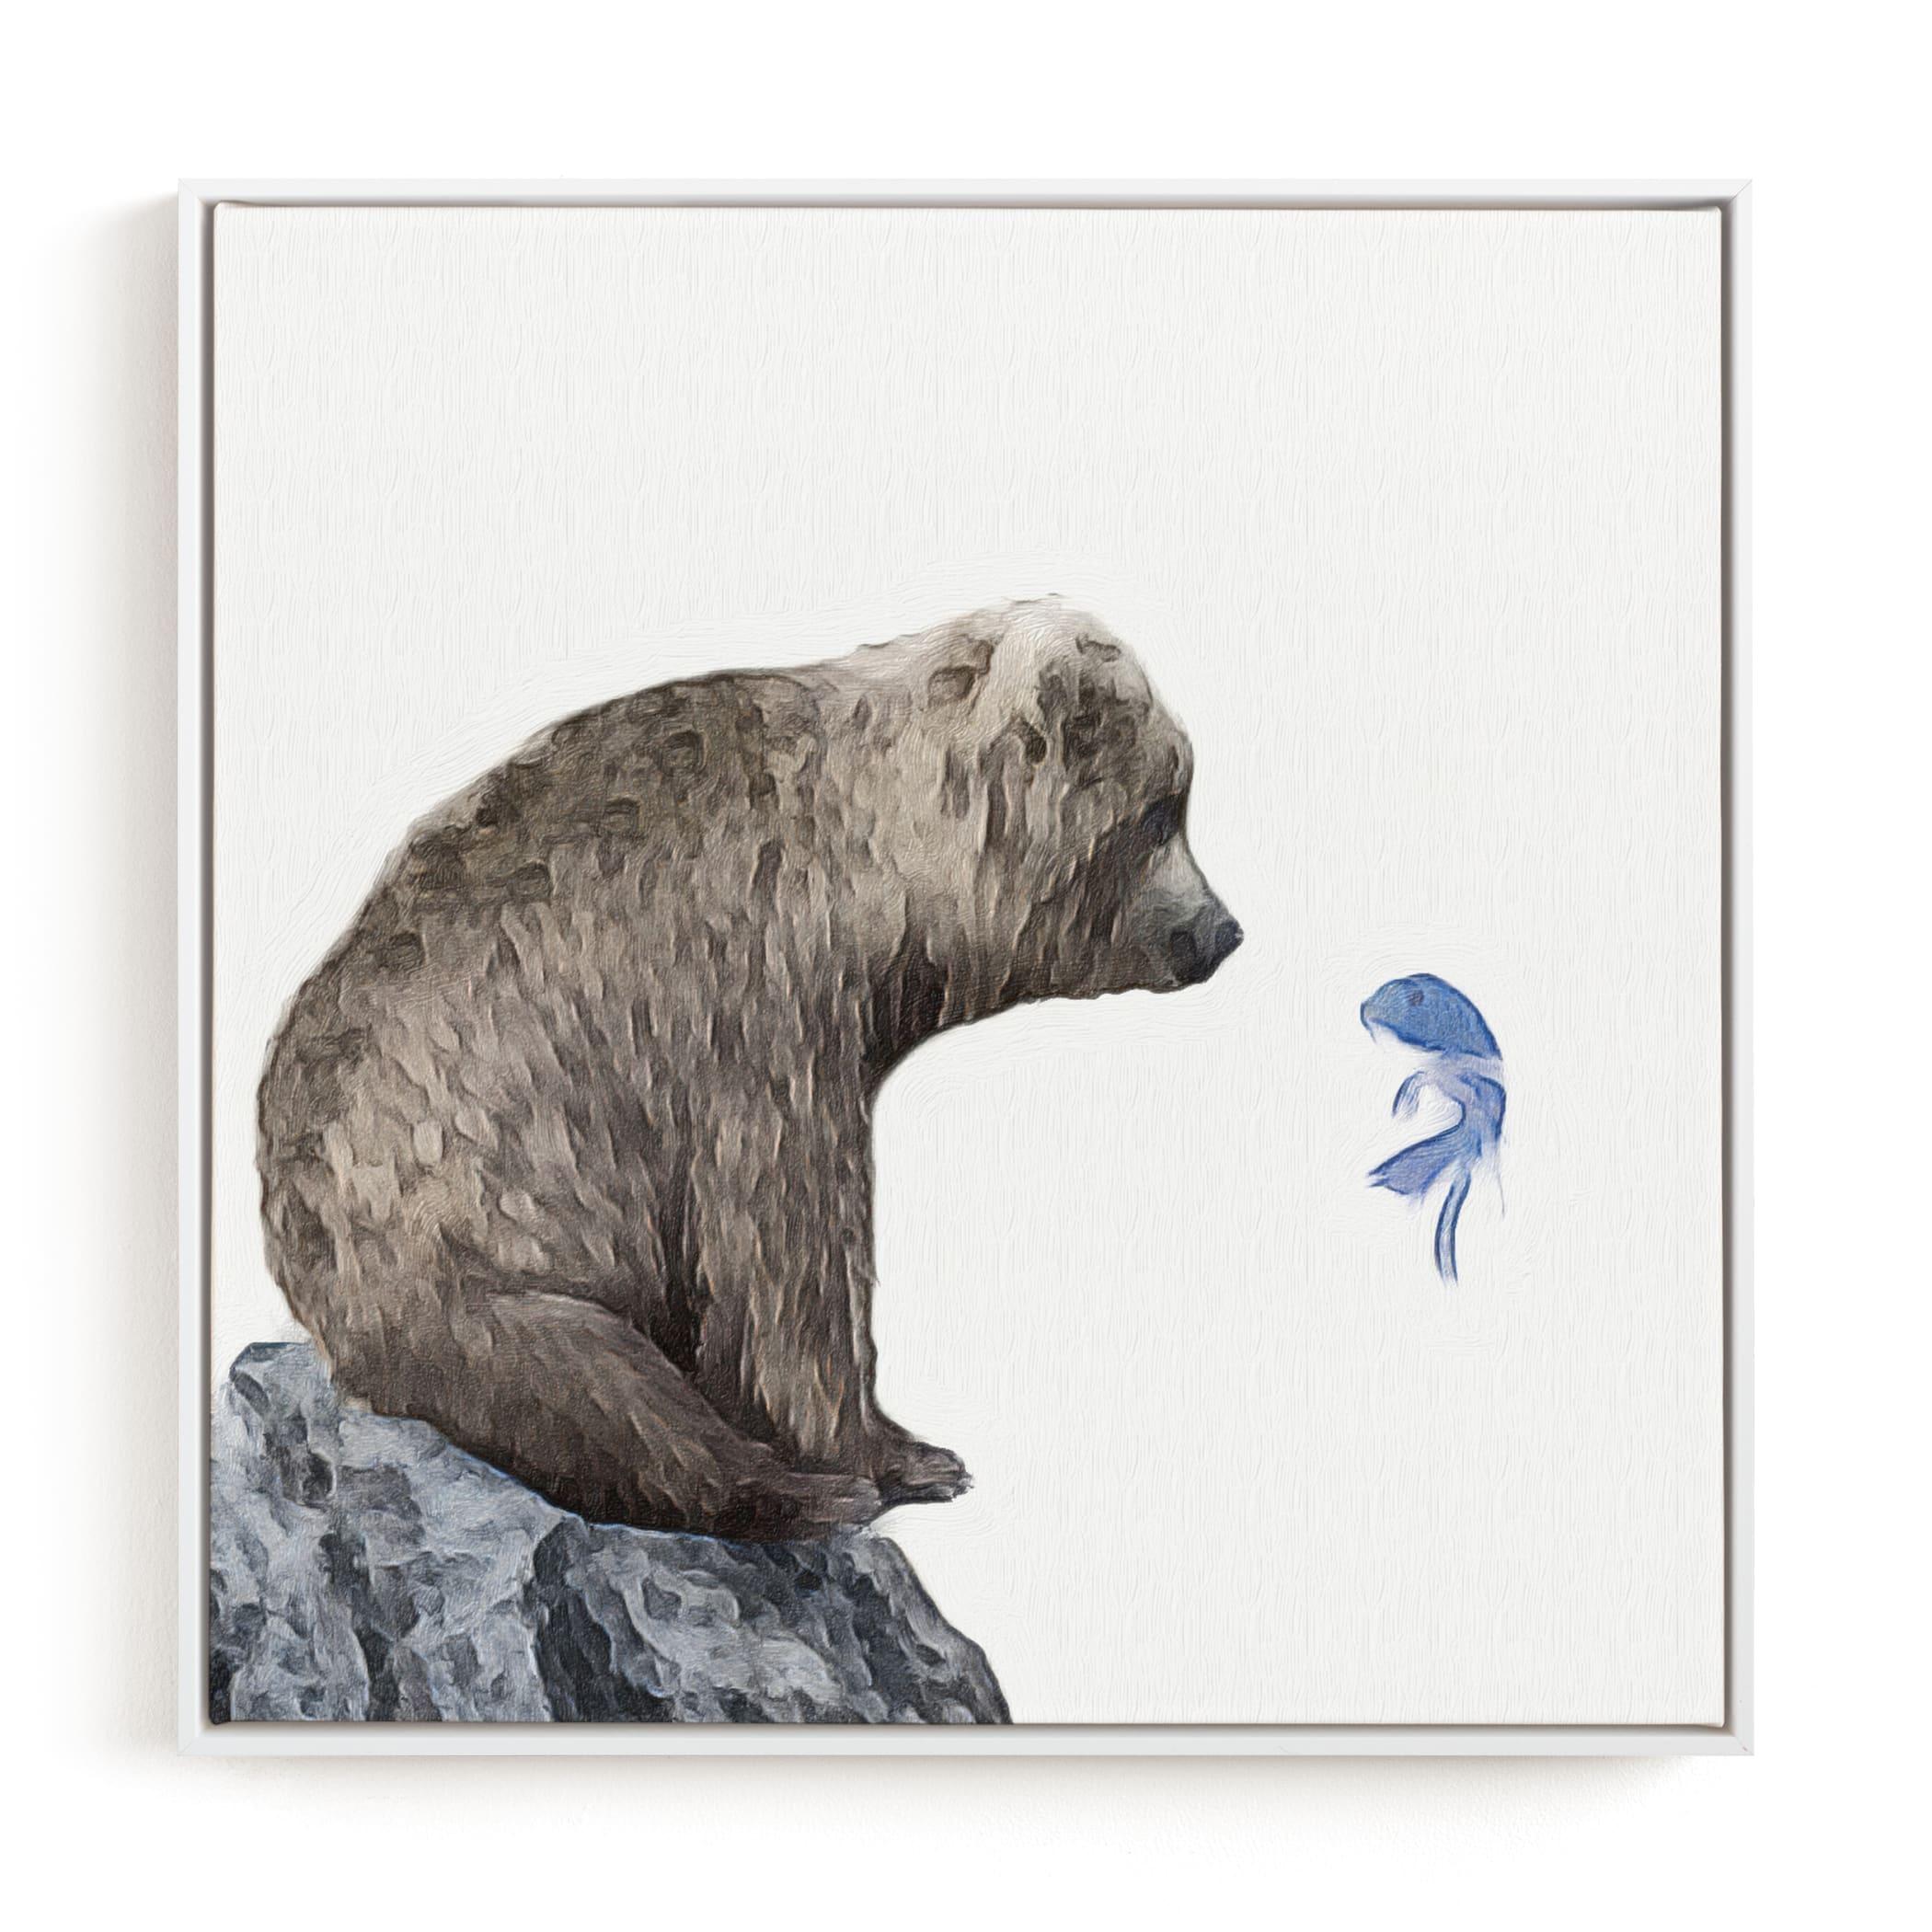 Blue Fish Wish Children's Art Print